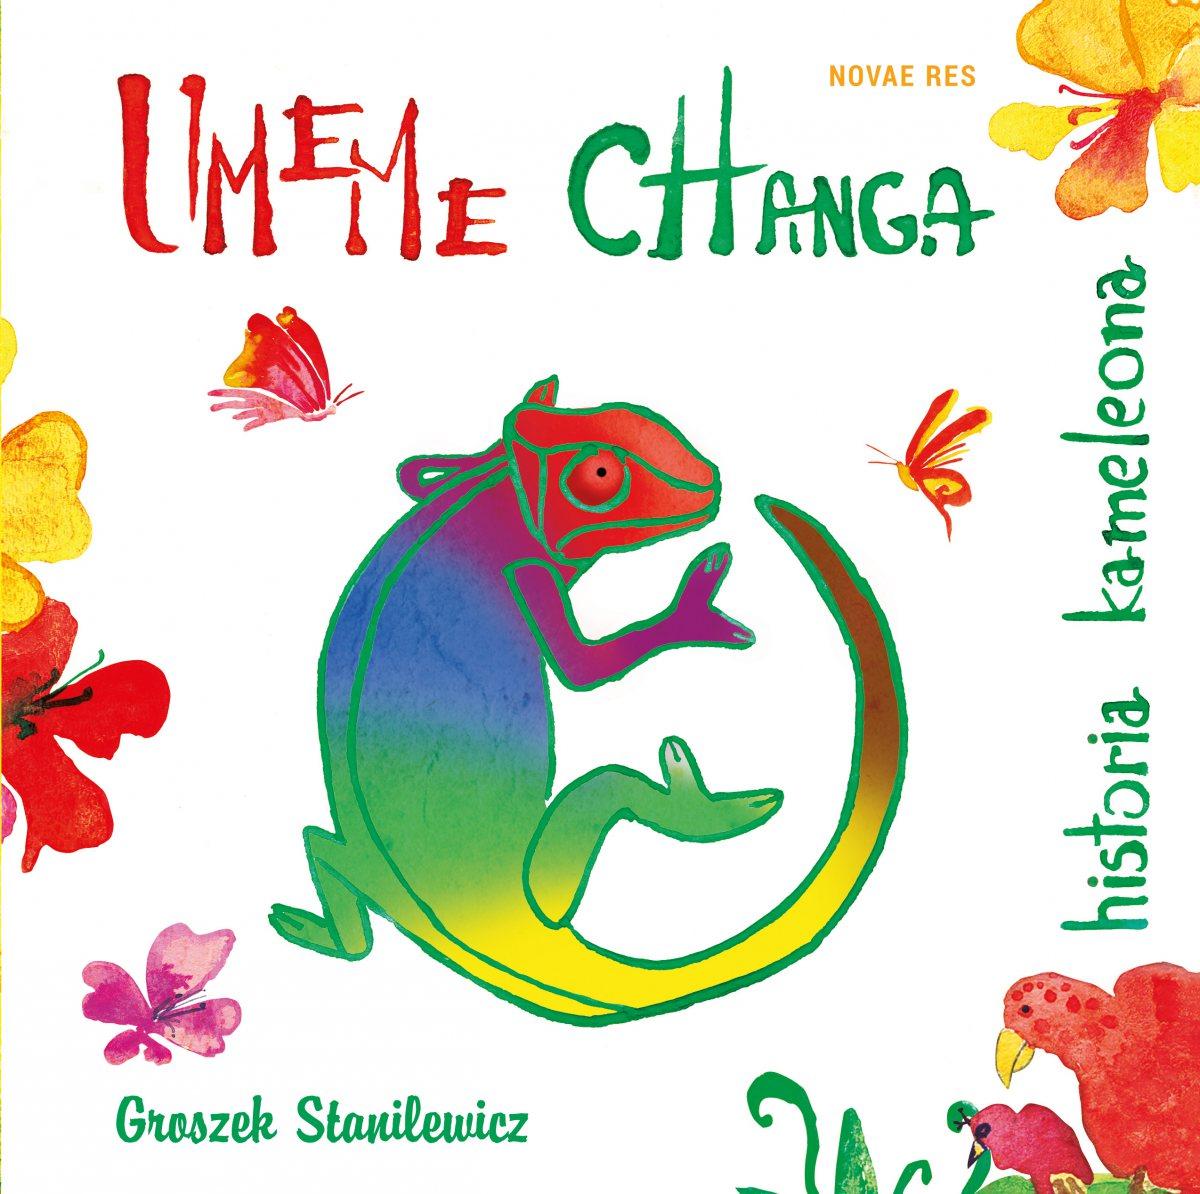 Umeme Changa - historia kameleona - Ebook (Książka na Kindle) do pobrania w formacie MOBI